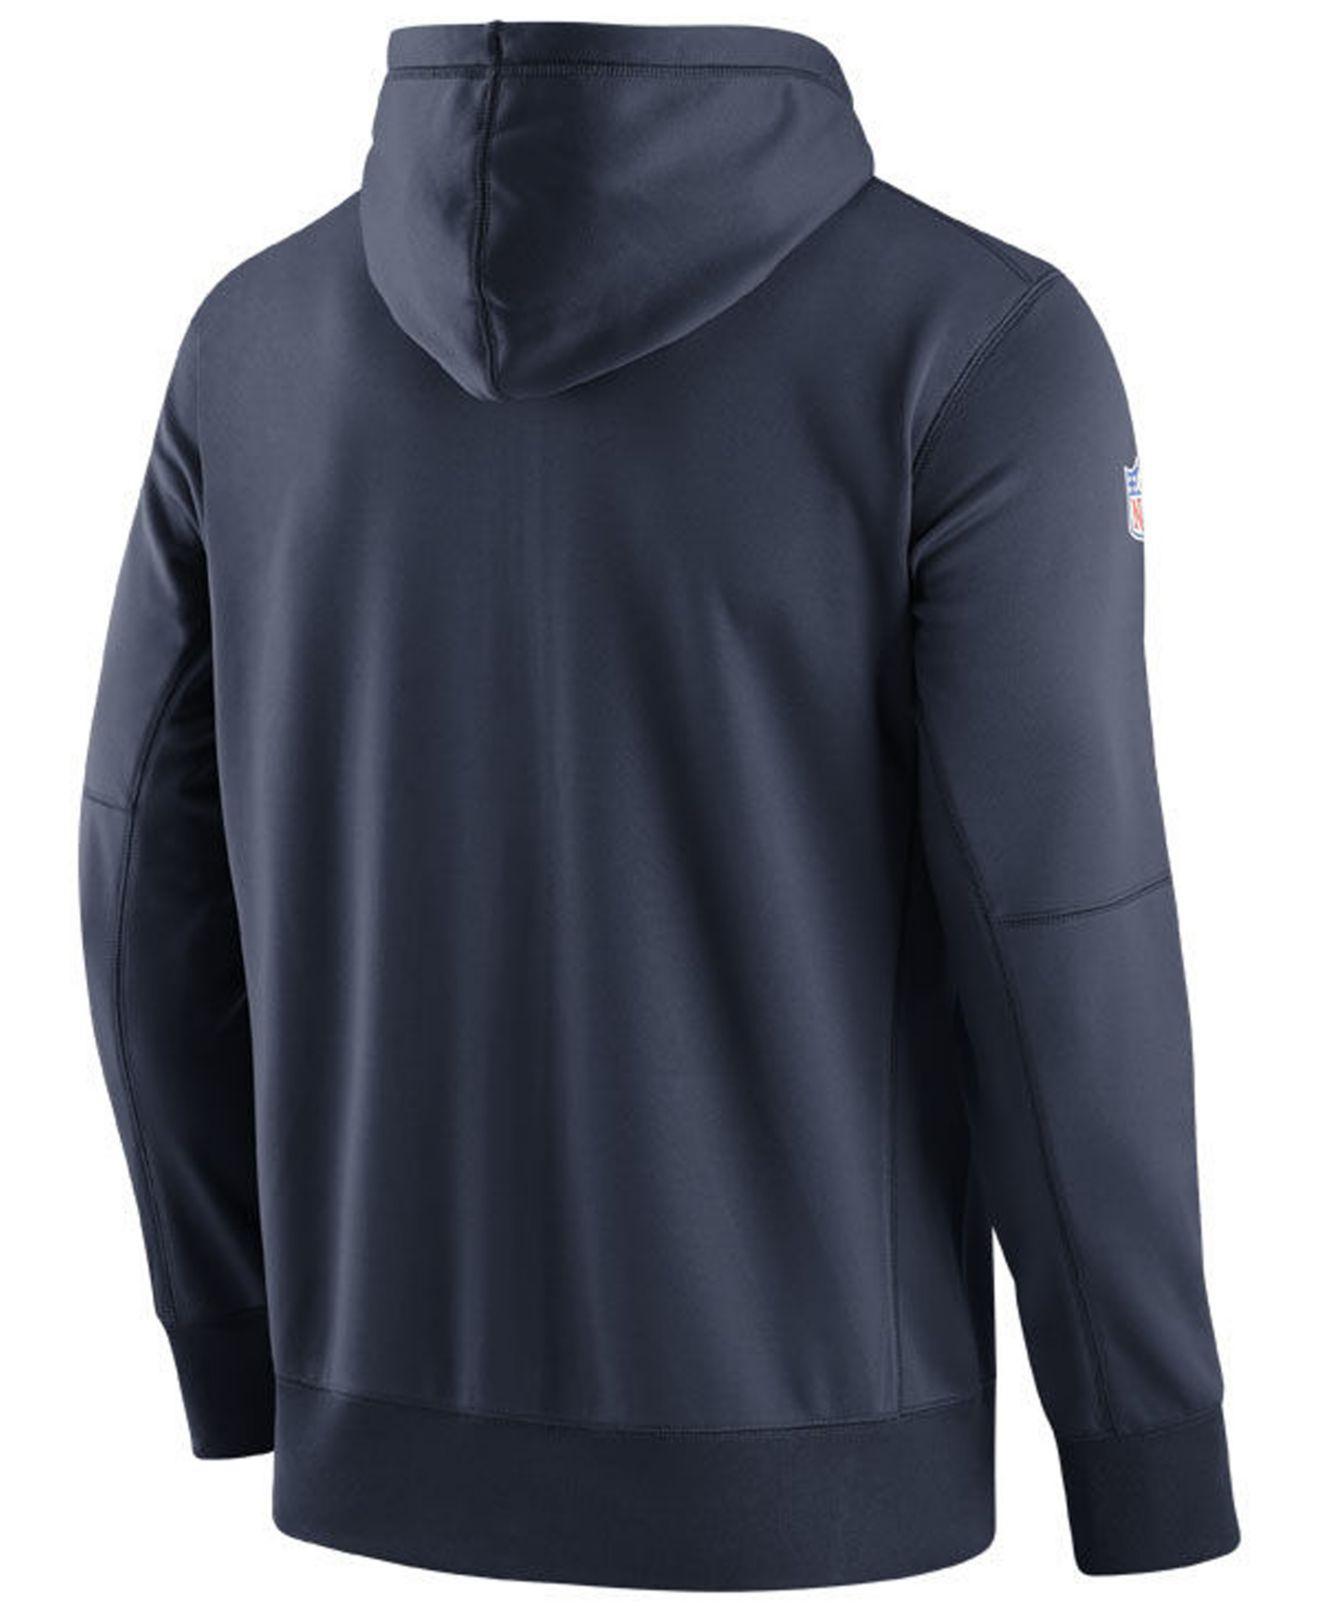 Lyst - Nike Denver Broncos Seismic Therma Full-zip Hoodie in Blue for Men 43a3078dd